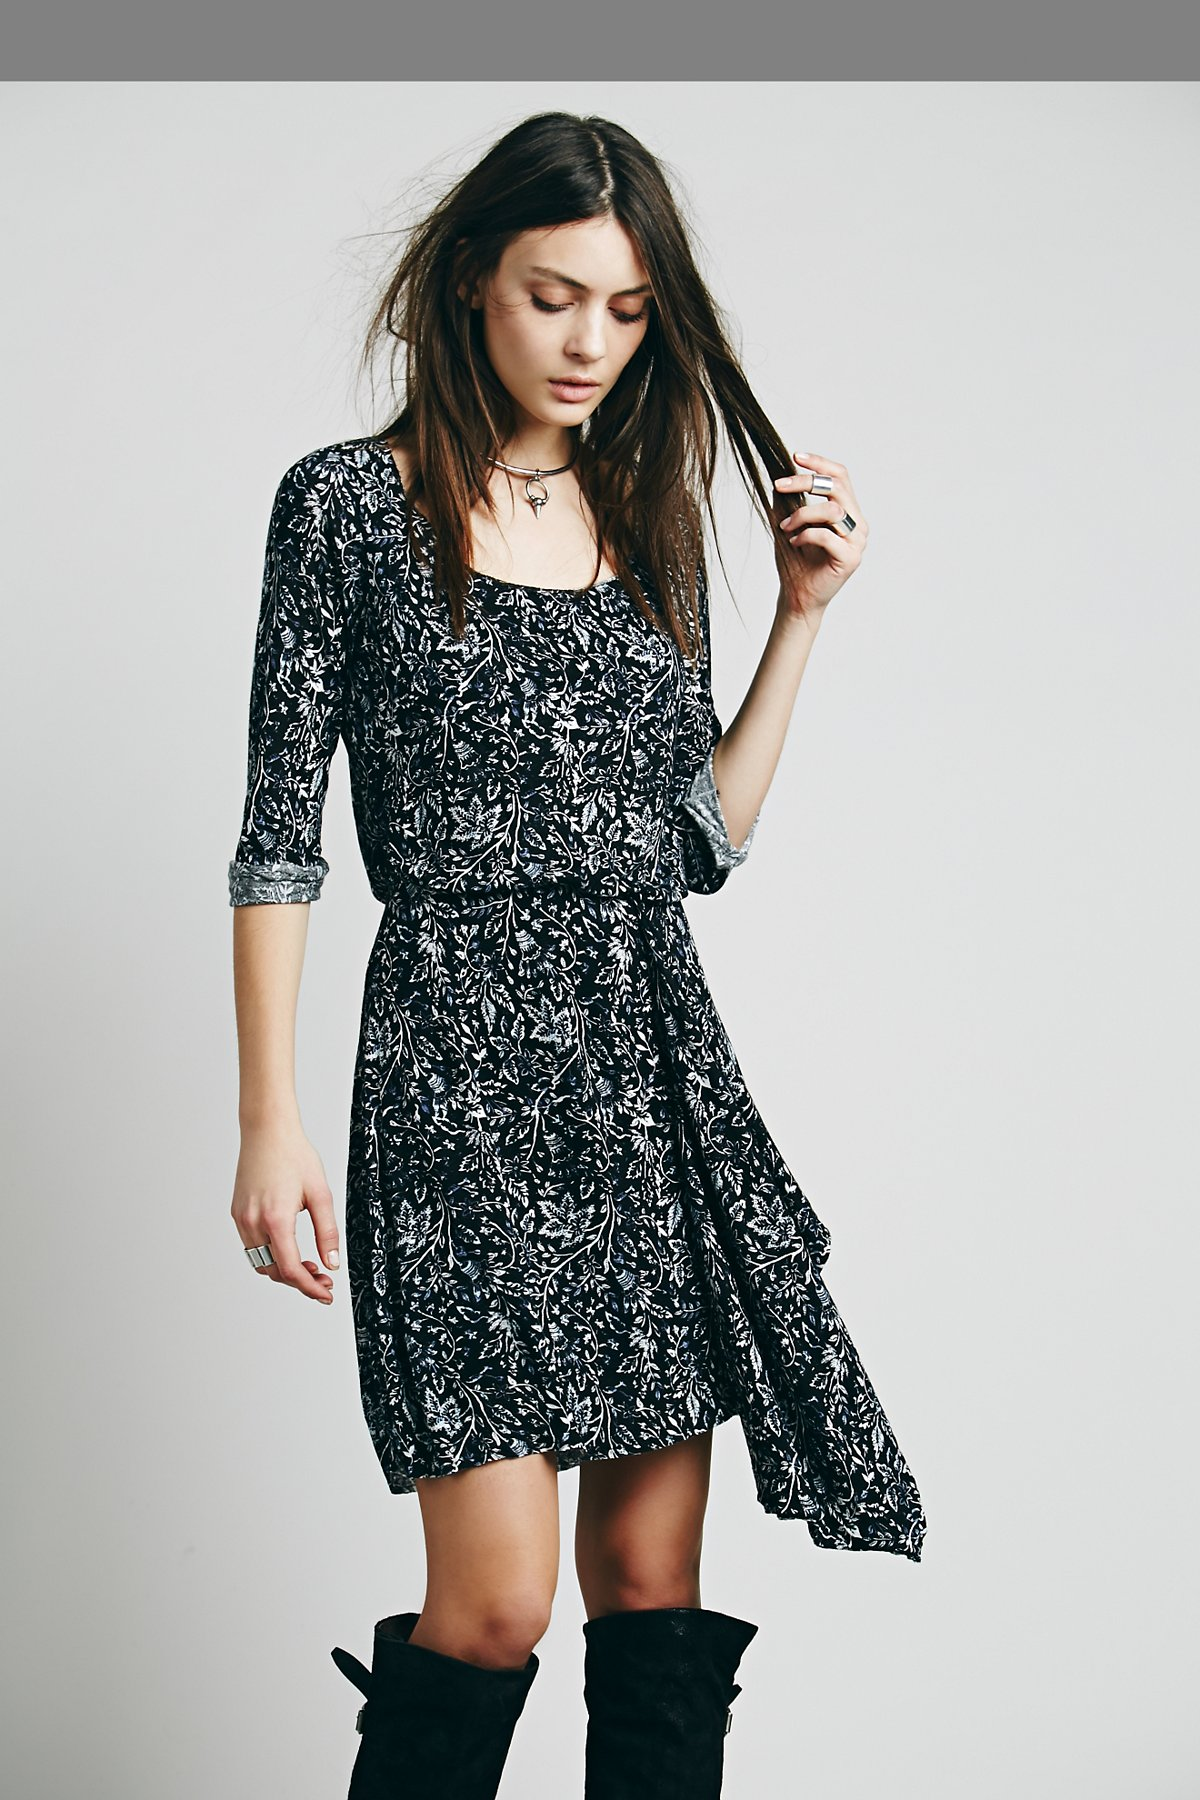 Maise Mini Dress